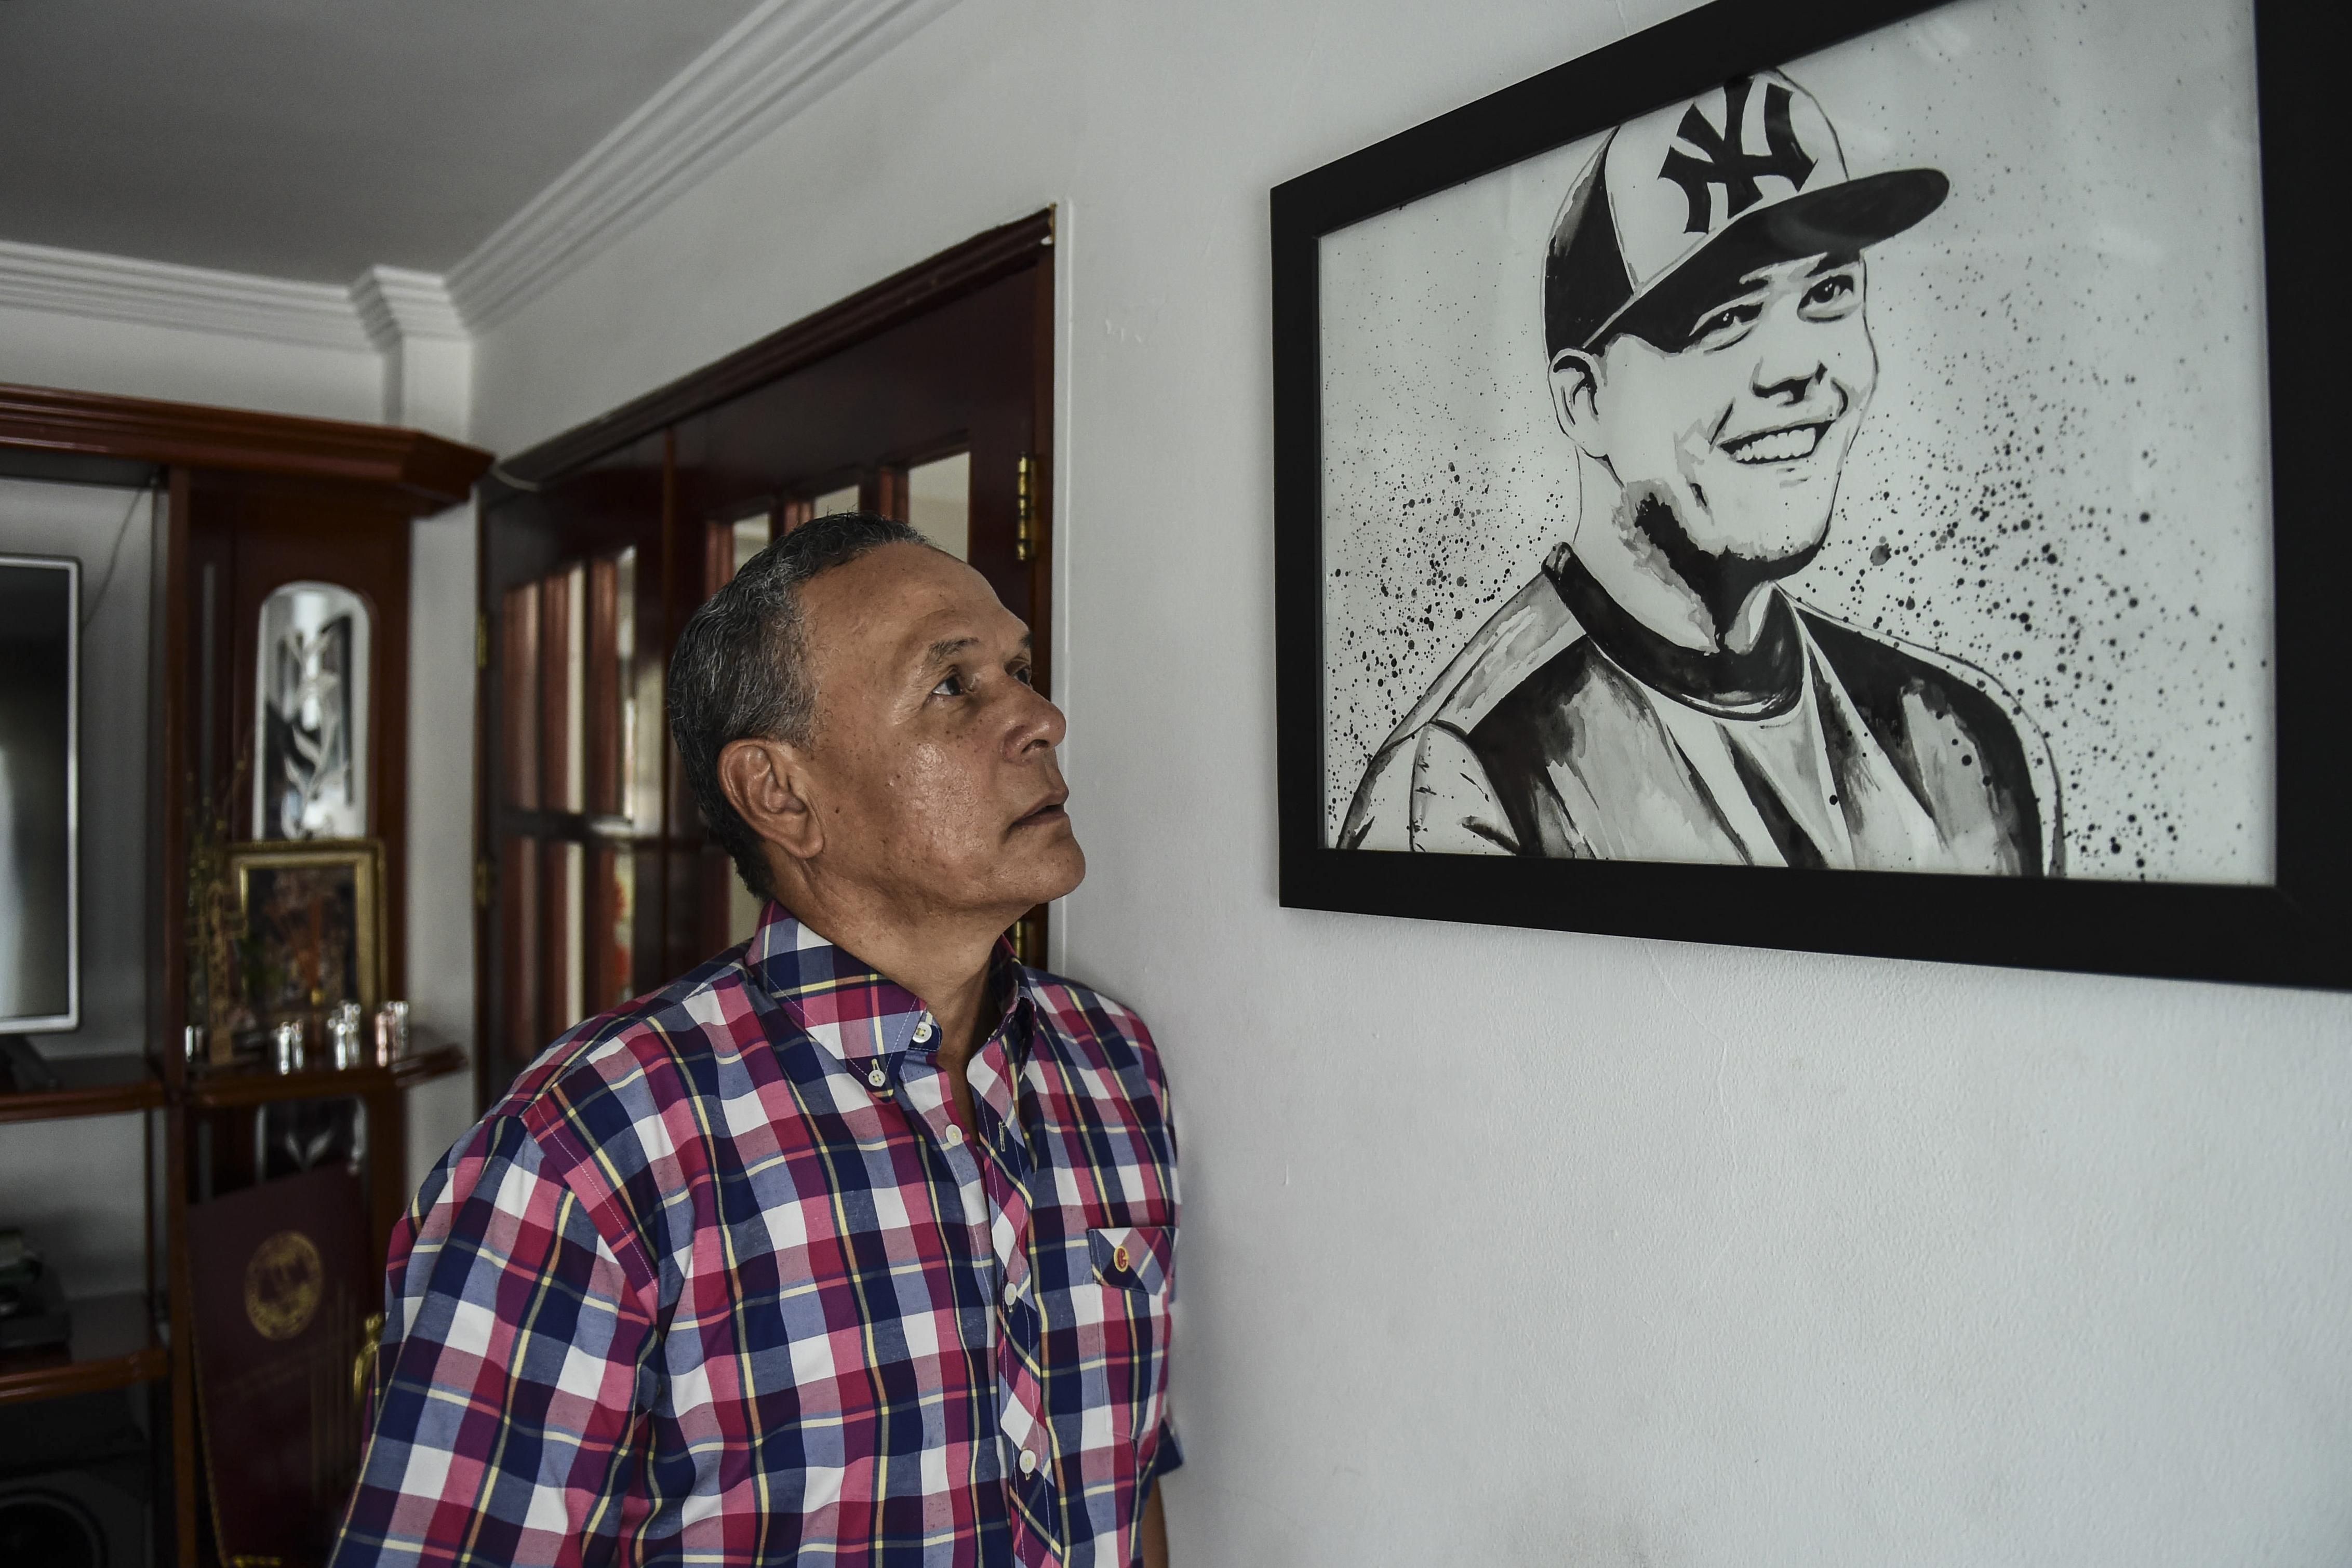 Álvaro Urshela, padre del tercera base de los Yanquis en la Gran Carpa.